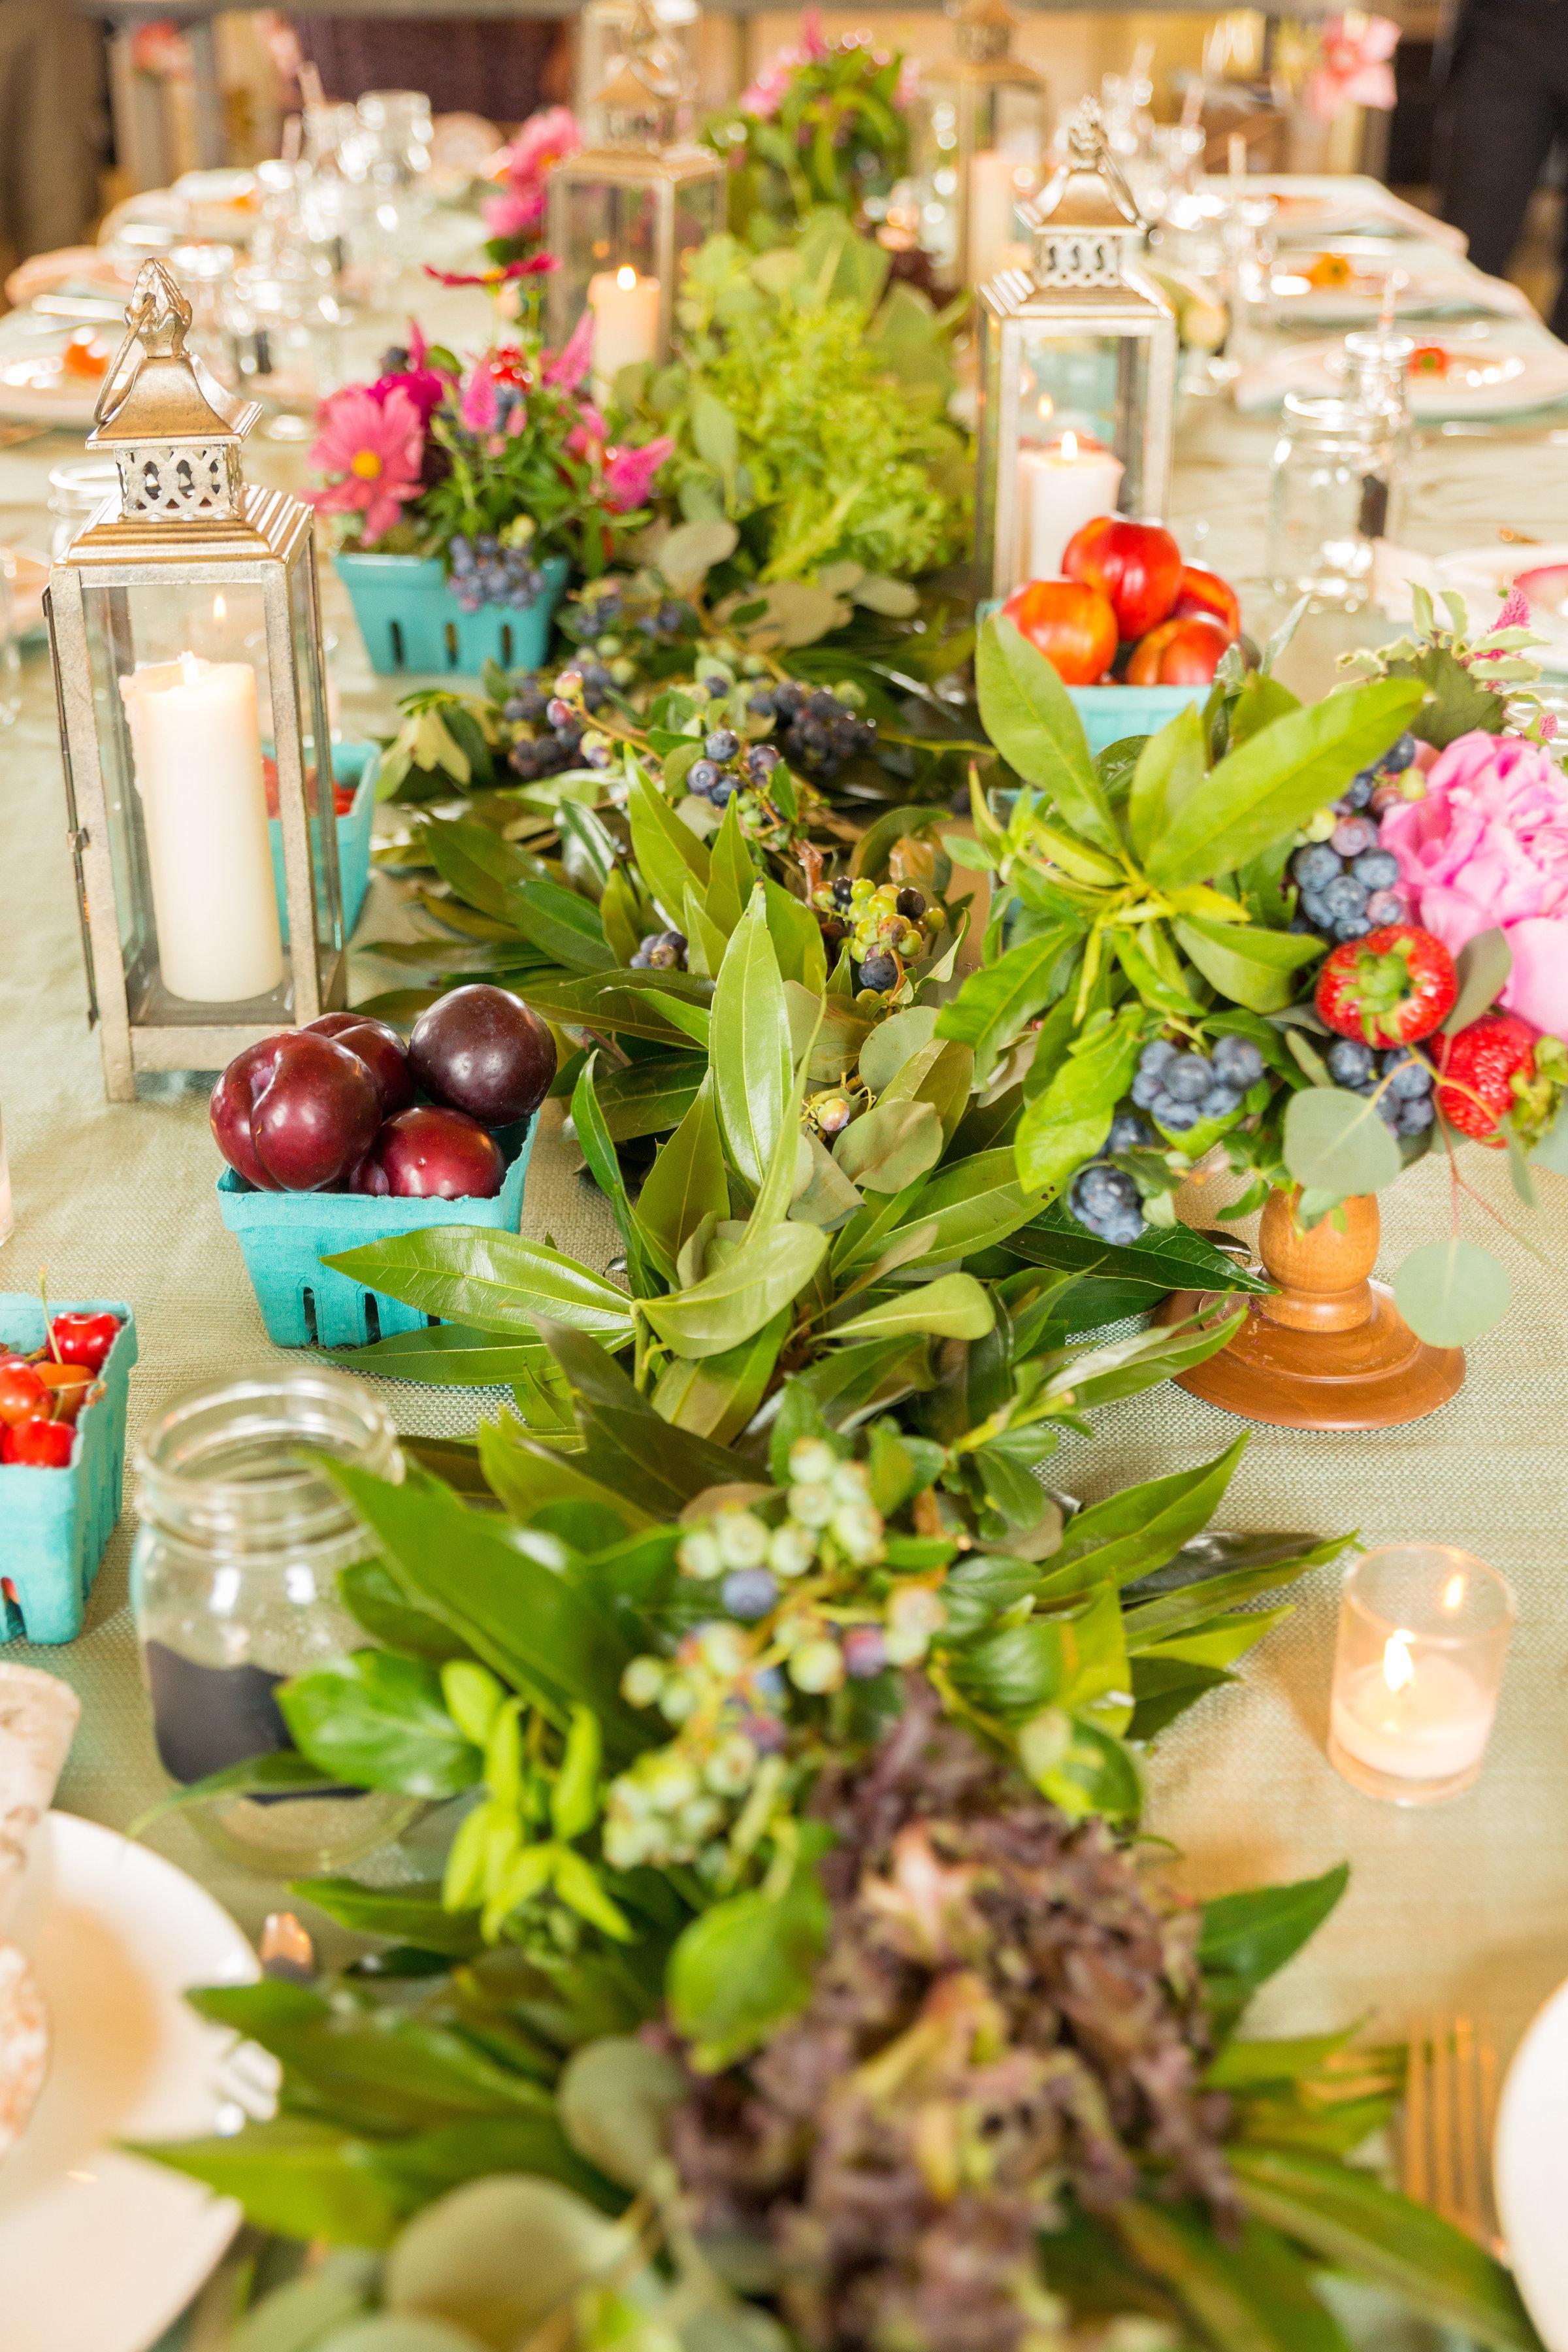 Danielle-Jeff-Farm-to-table-wedding-photography-love-story-studios-0029.jpg